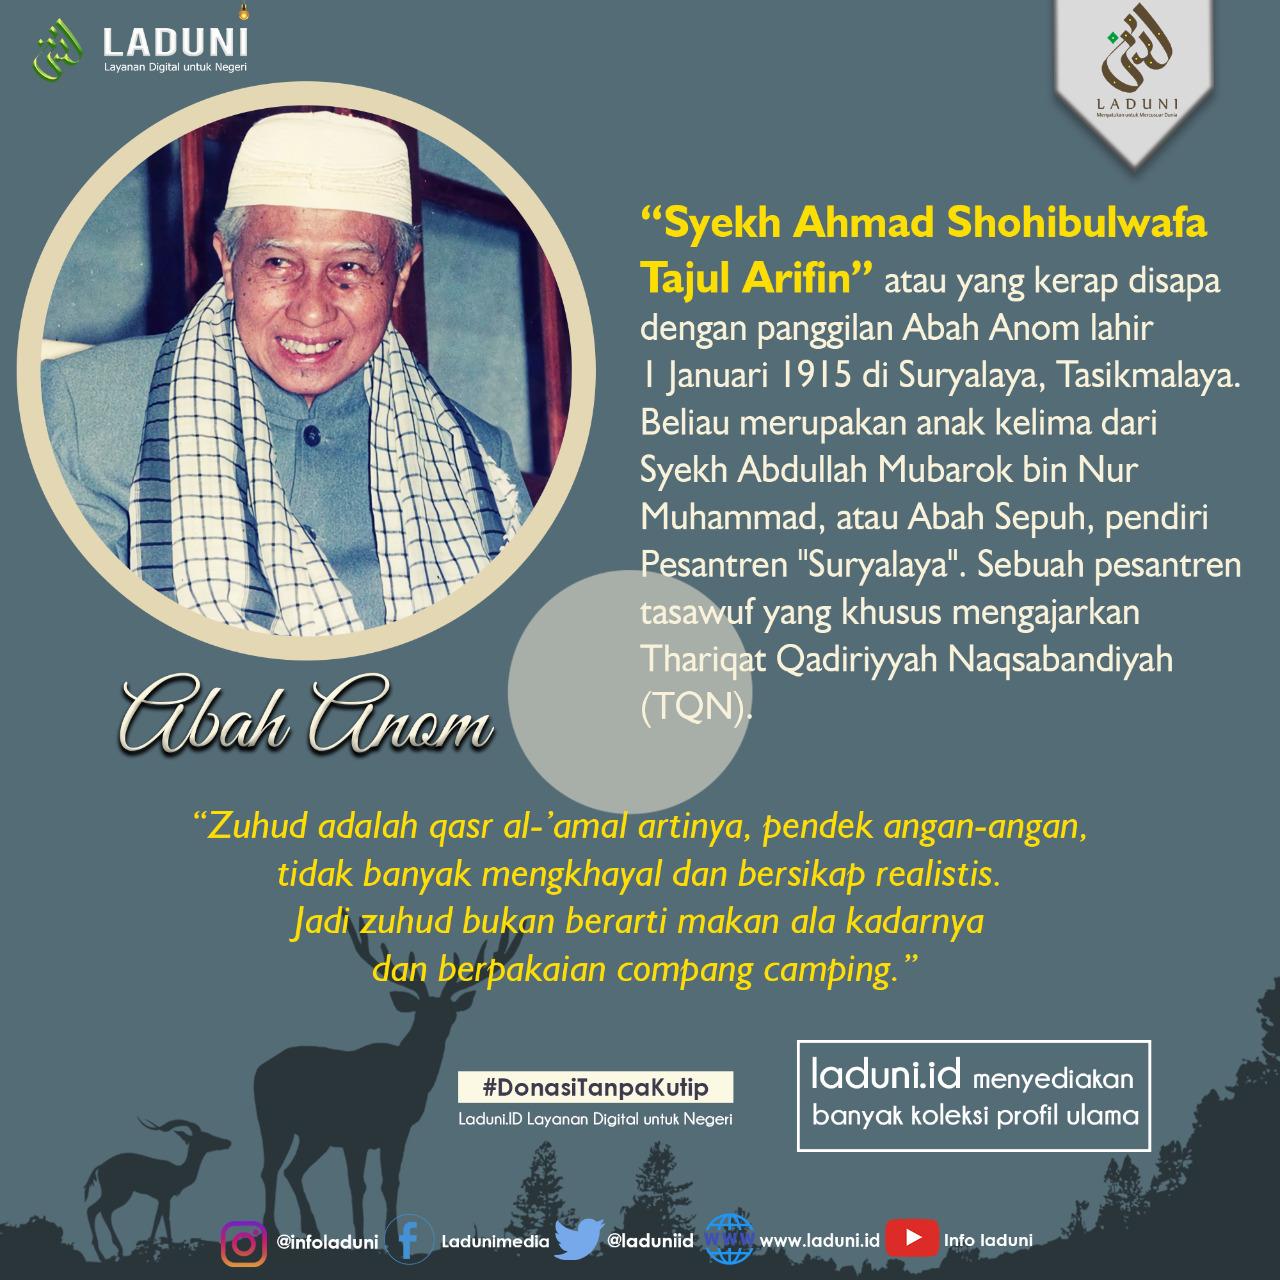 Biografi Syekh Ahmad Shohibulwafa Tajul Arifin (Abah Anom)